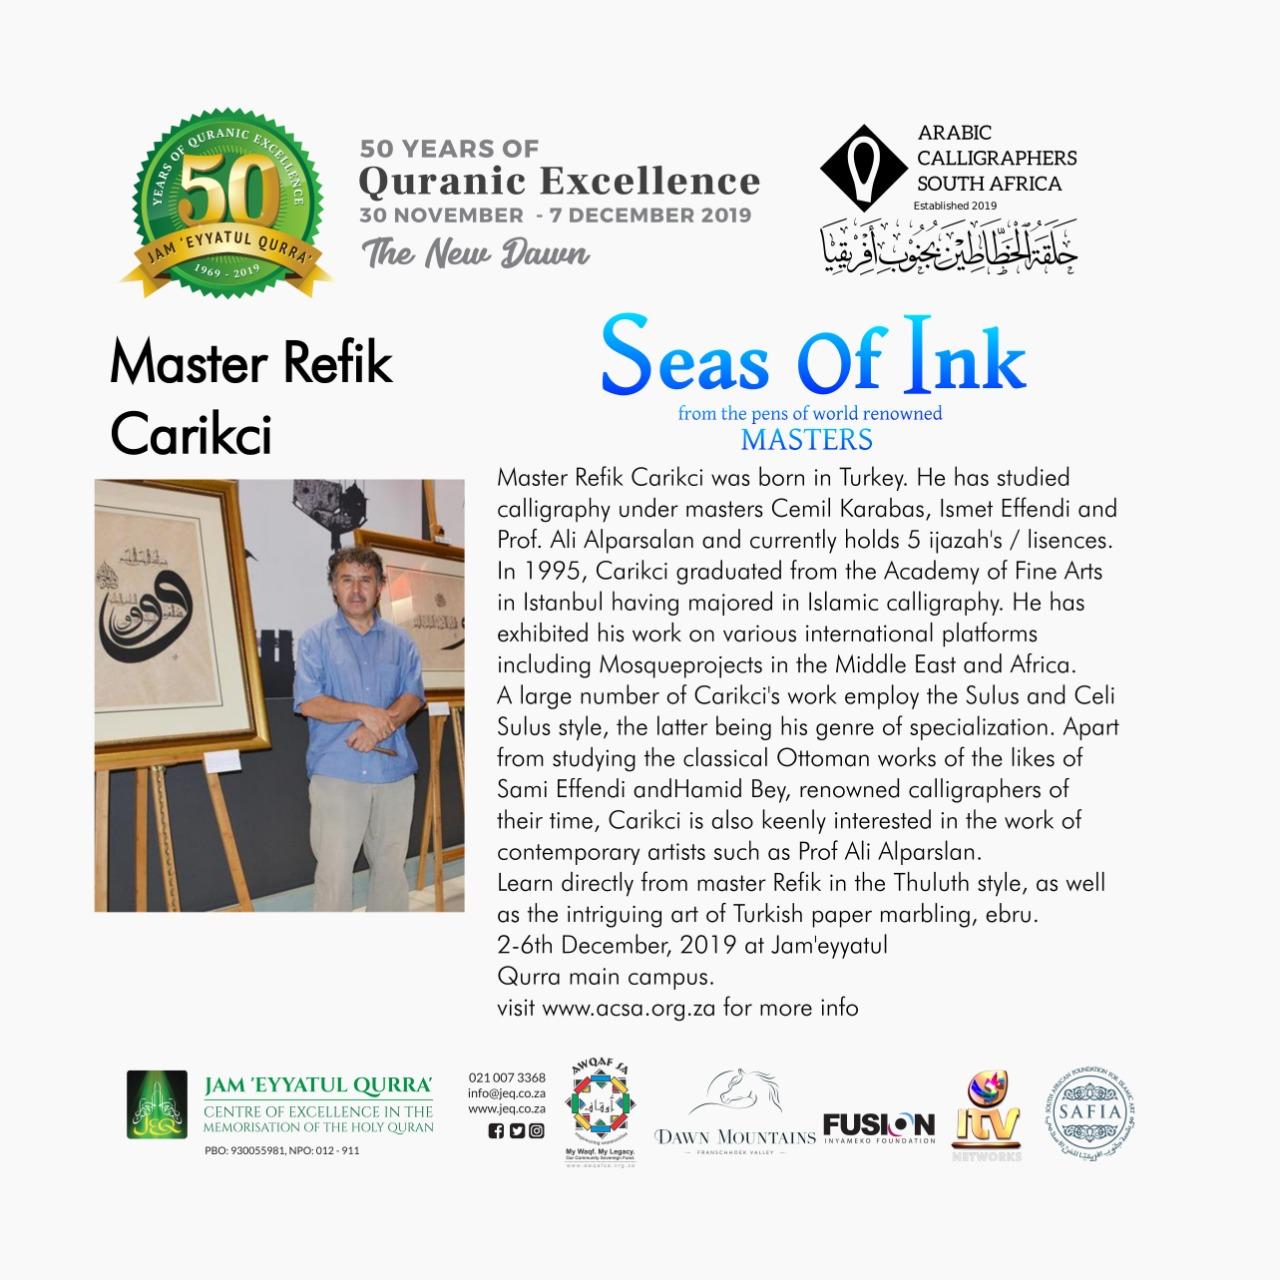 Master Refik Carikci